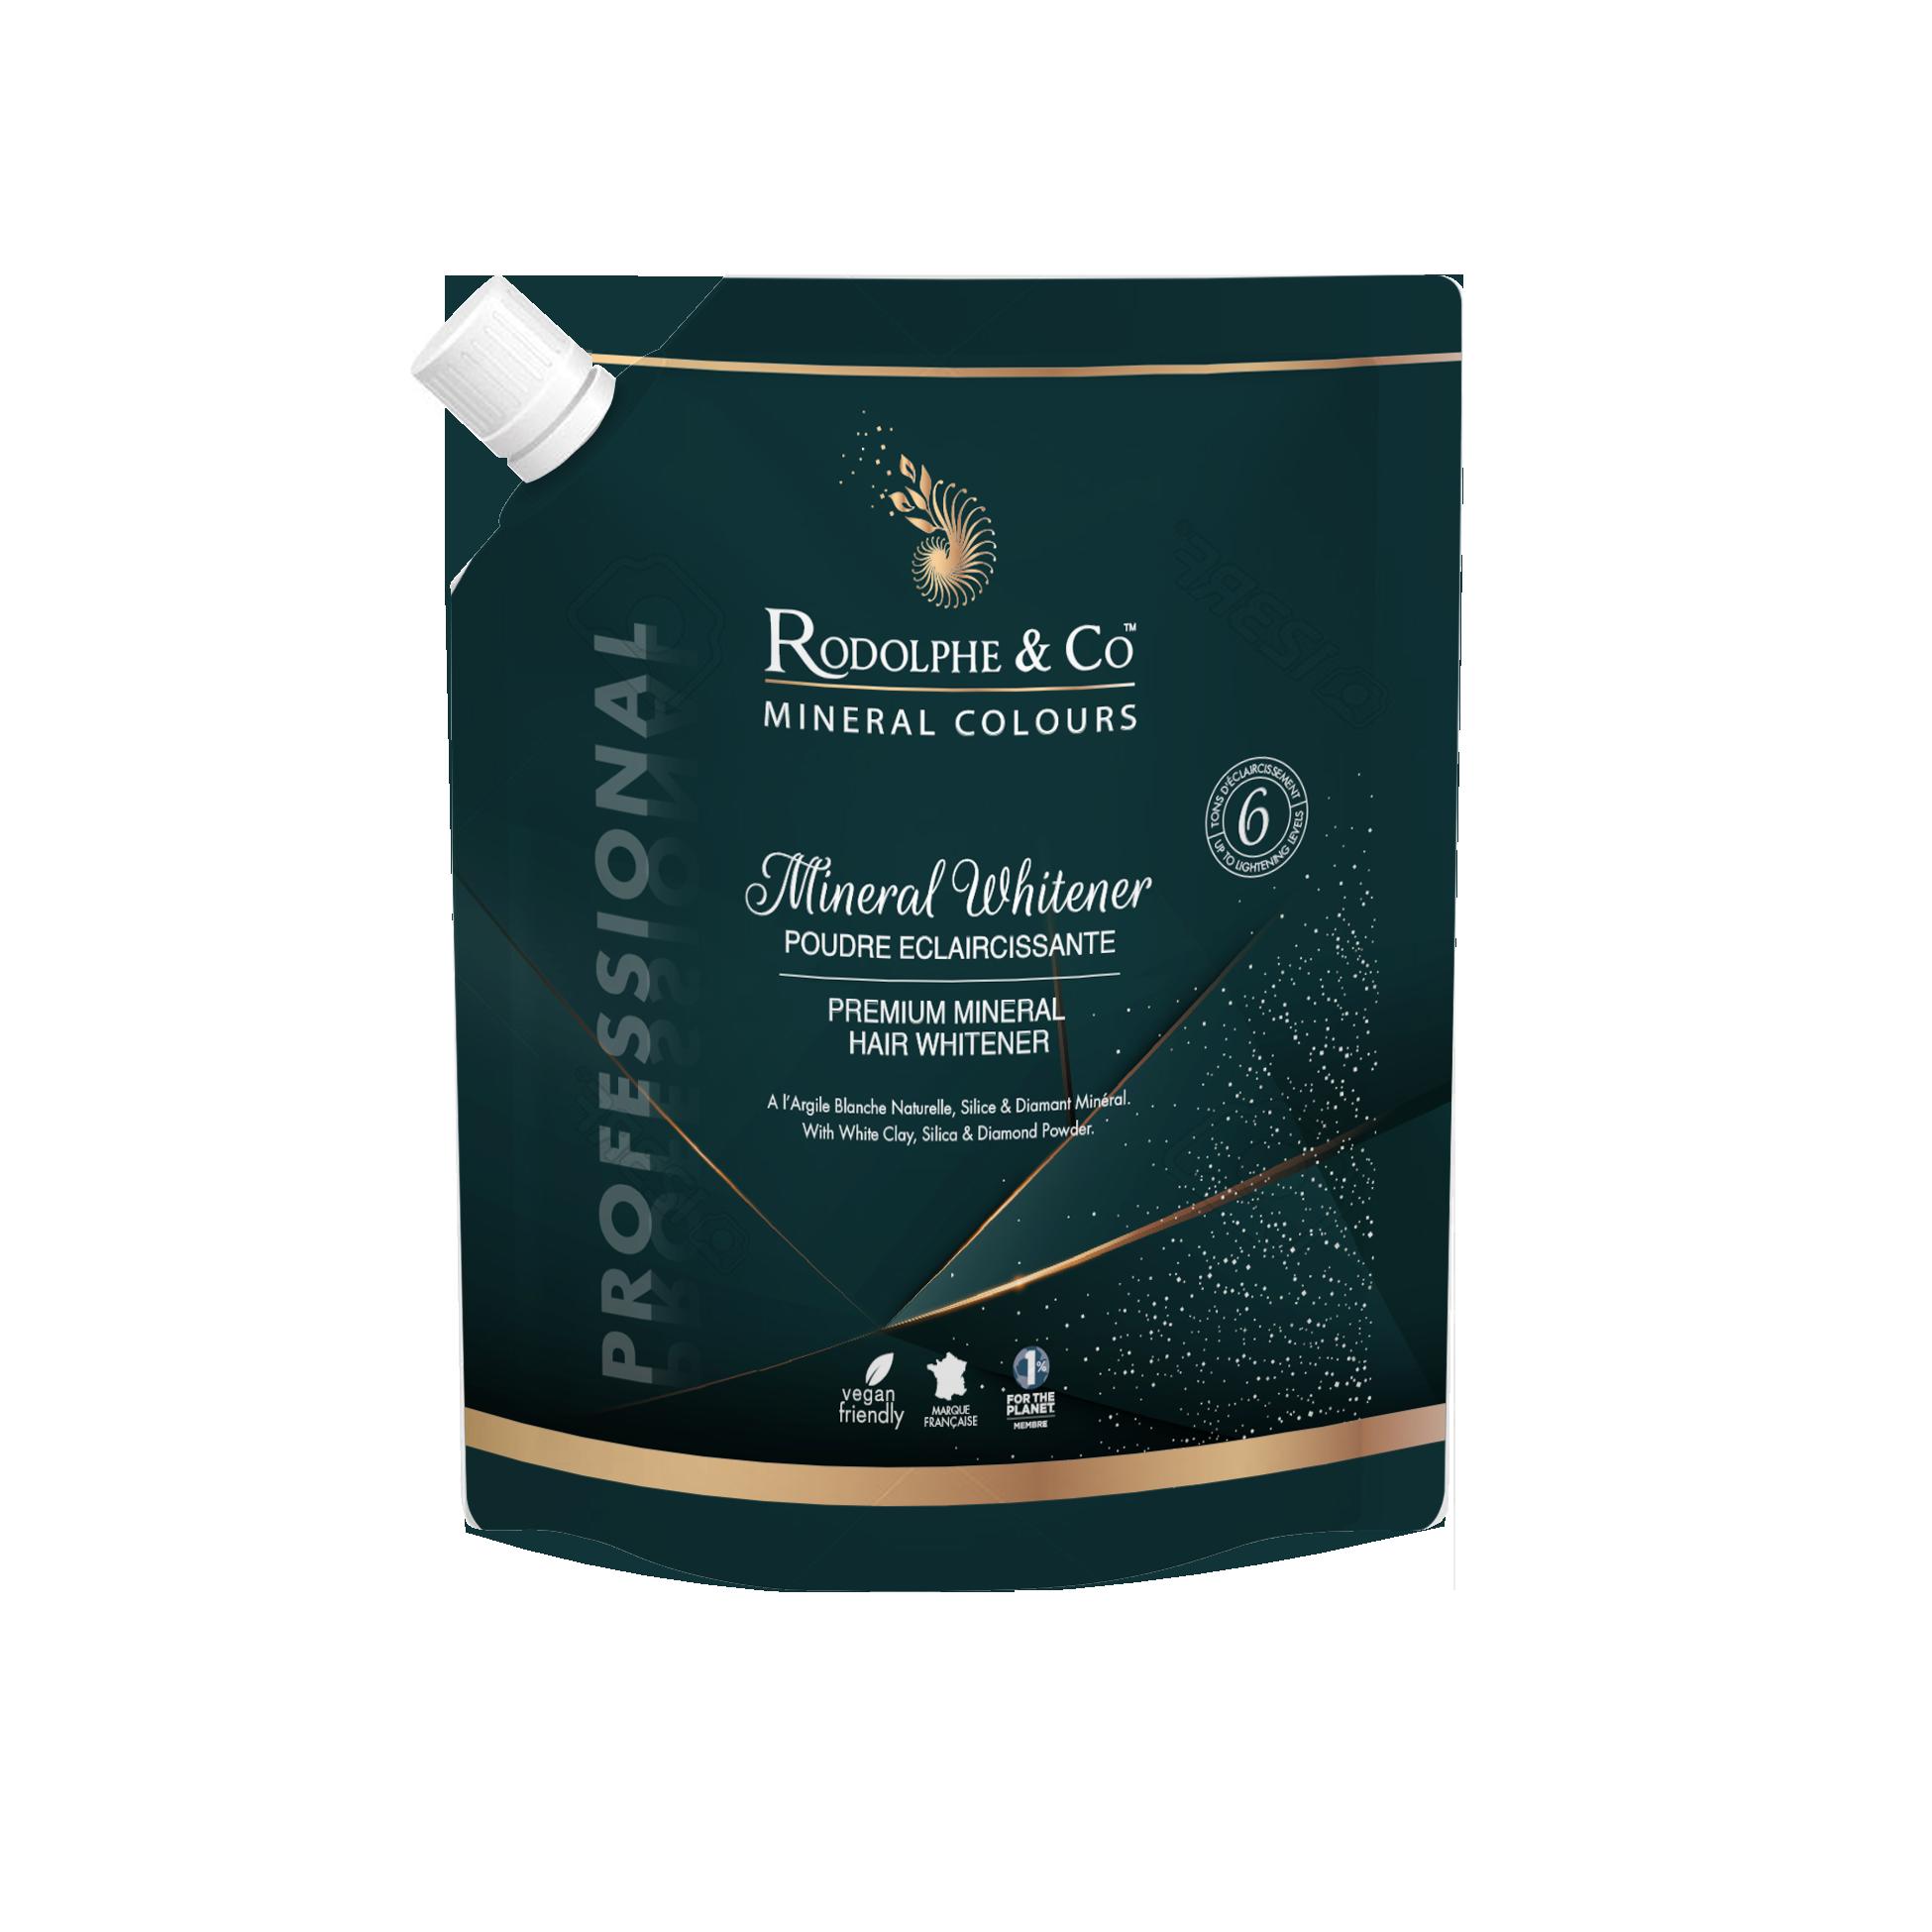 Mineral Whitener Rodolphe&Co